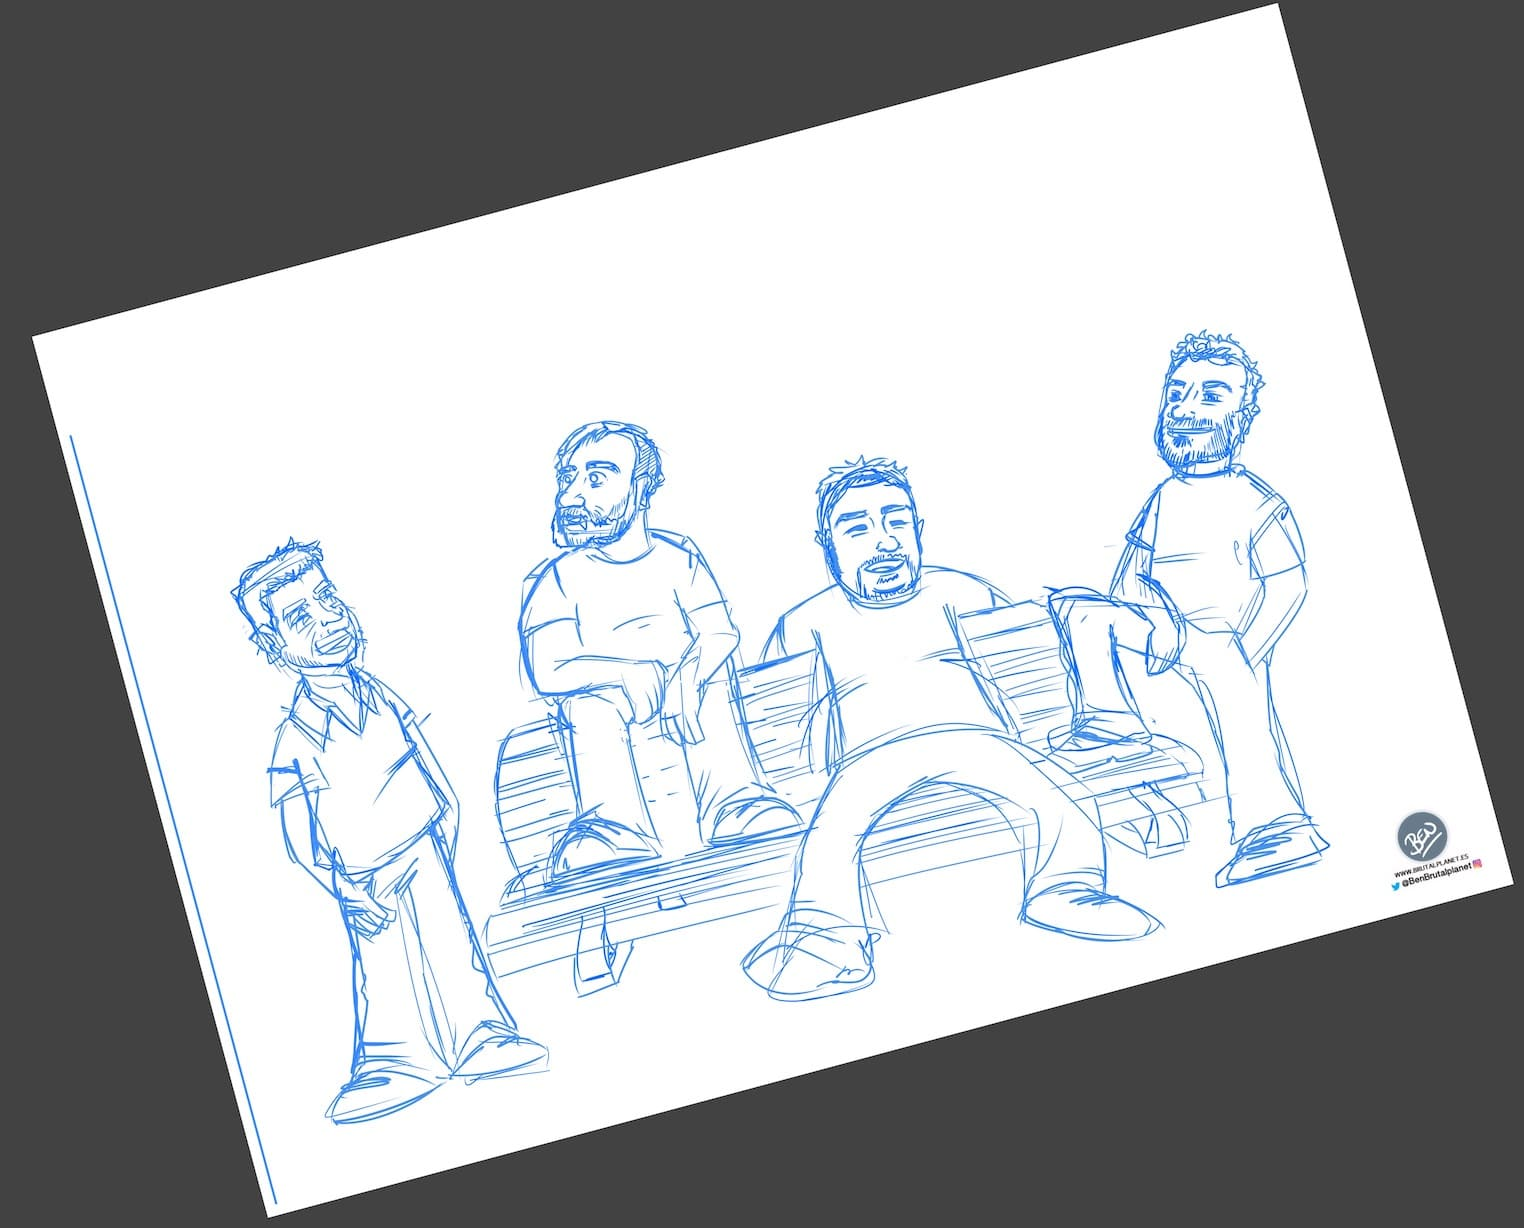 Caricatura Personalizada - Waiting on a Friend (Caricatura grupo de amigos) - 1